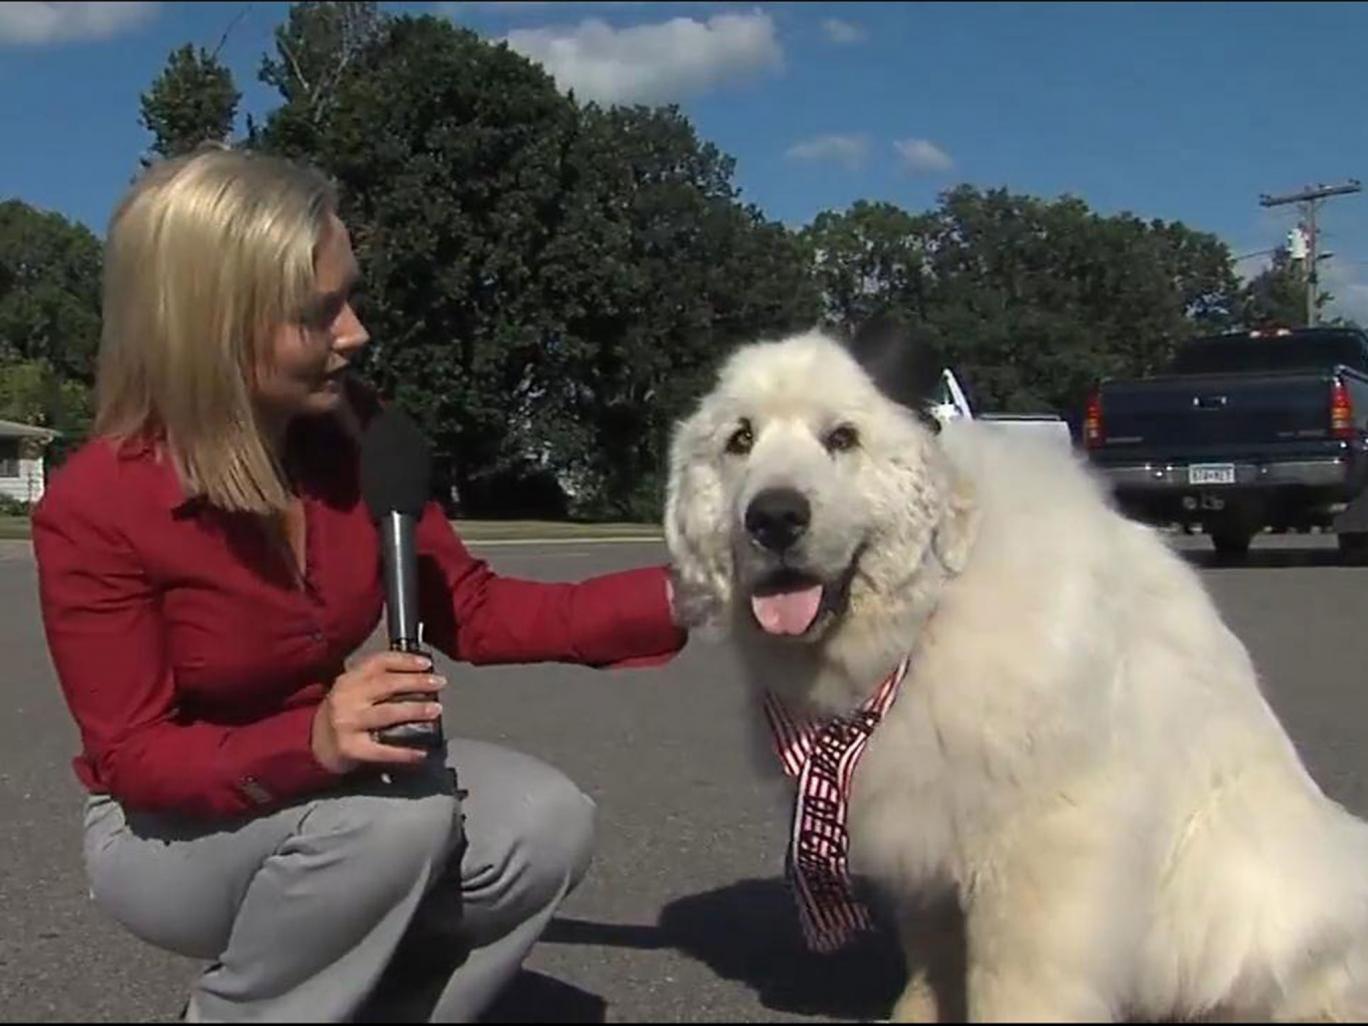 Duke has been elected the new mayor of Cormorant in Minnesota.